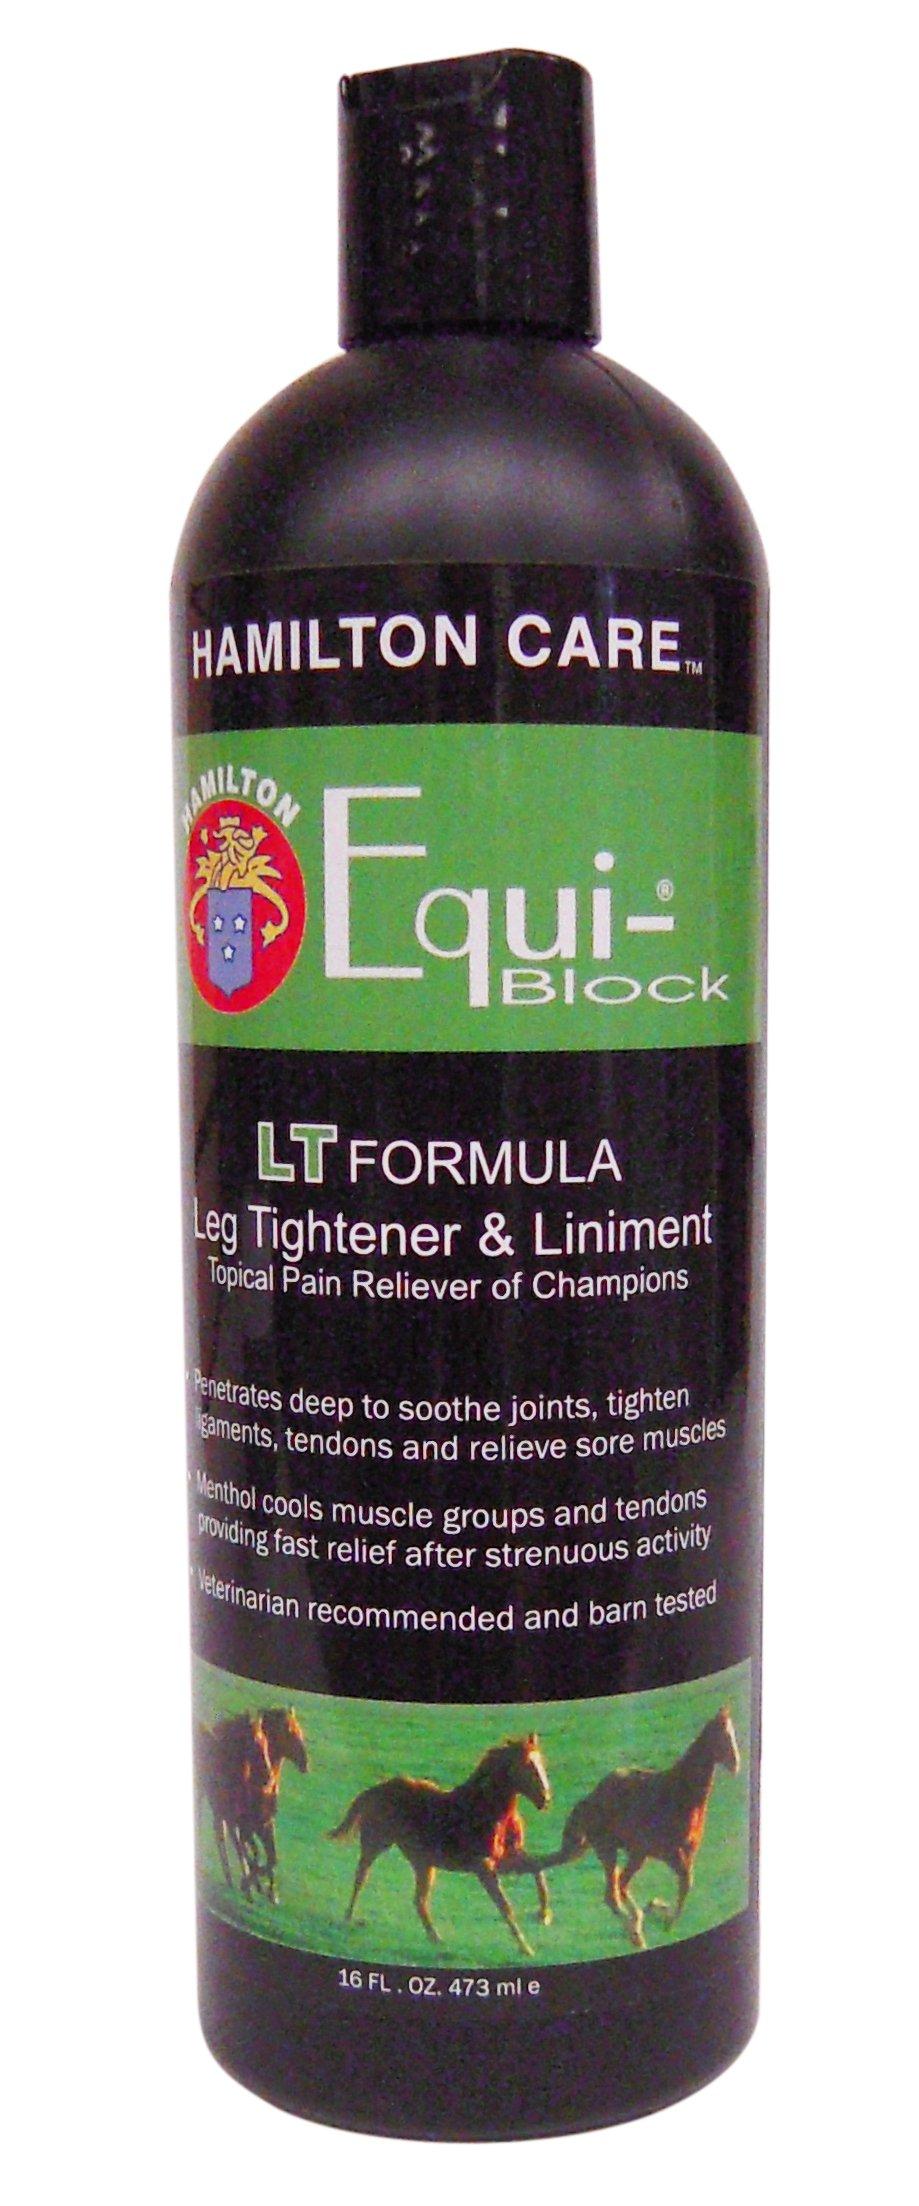 Hamilton Care Equi-Block Horse Leg Tightener & Liniment Light Formula, 16-Ounce by MiracleCorp by Hamilton Care